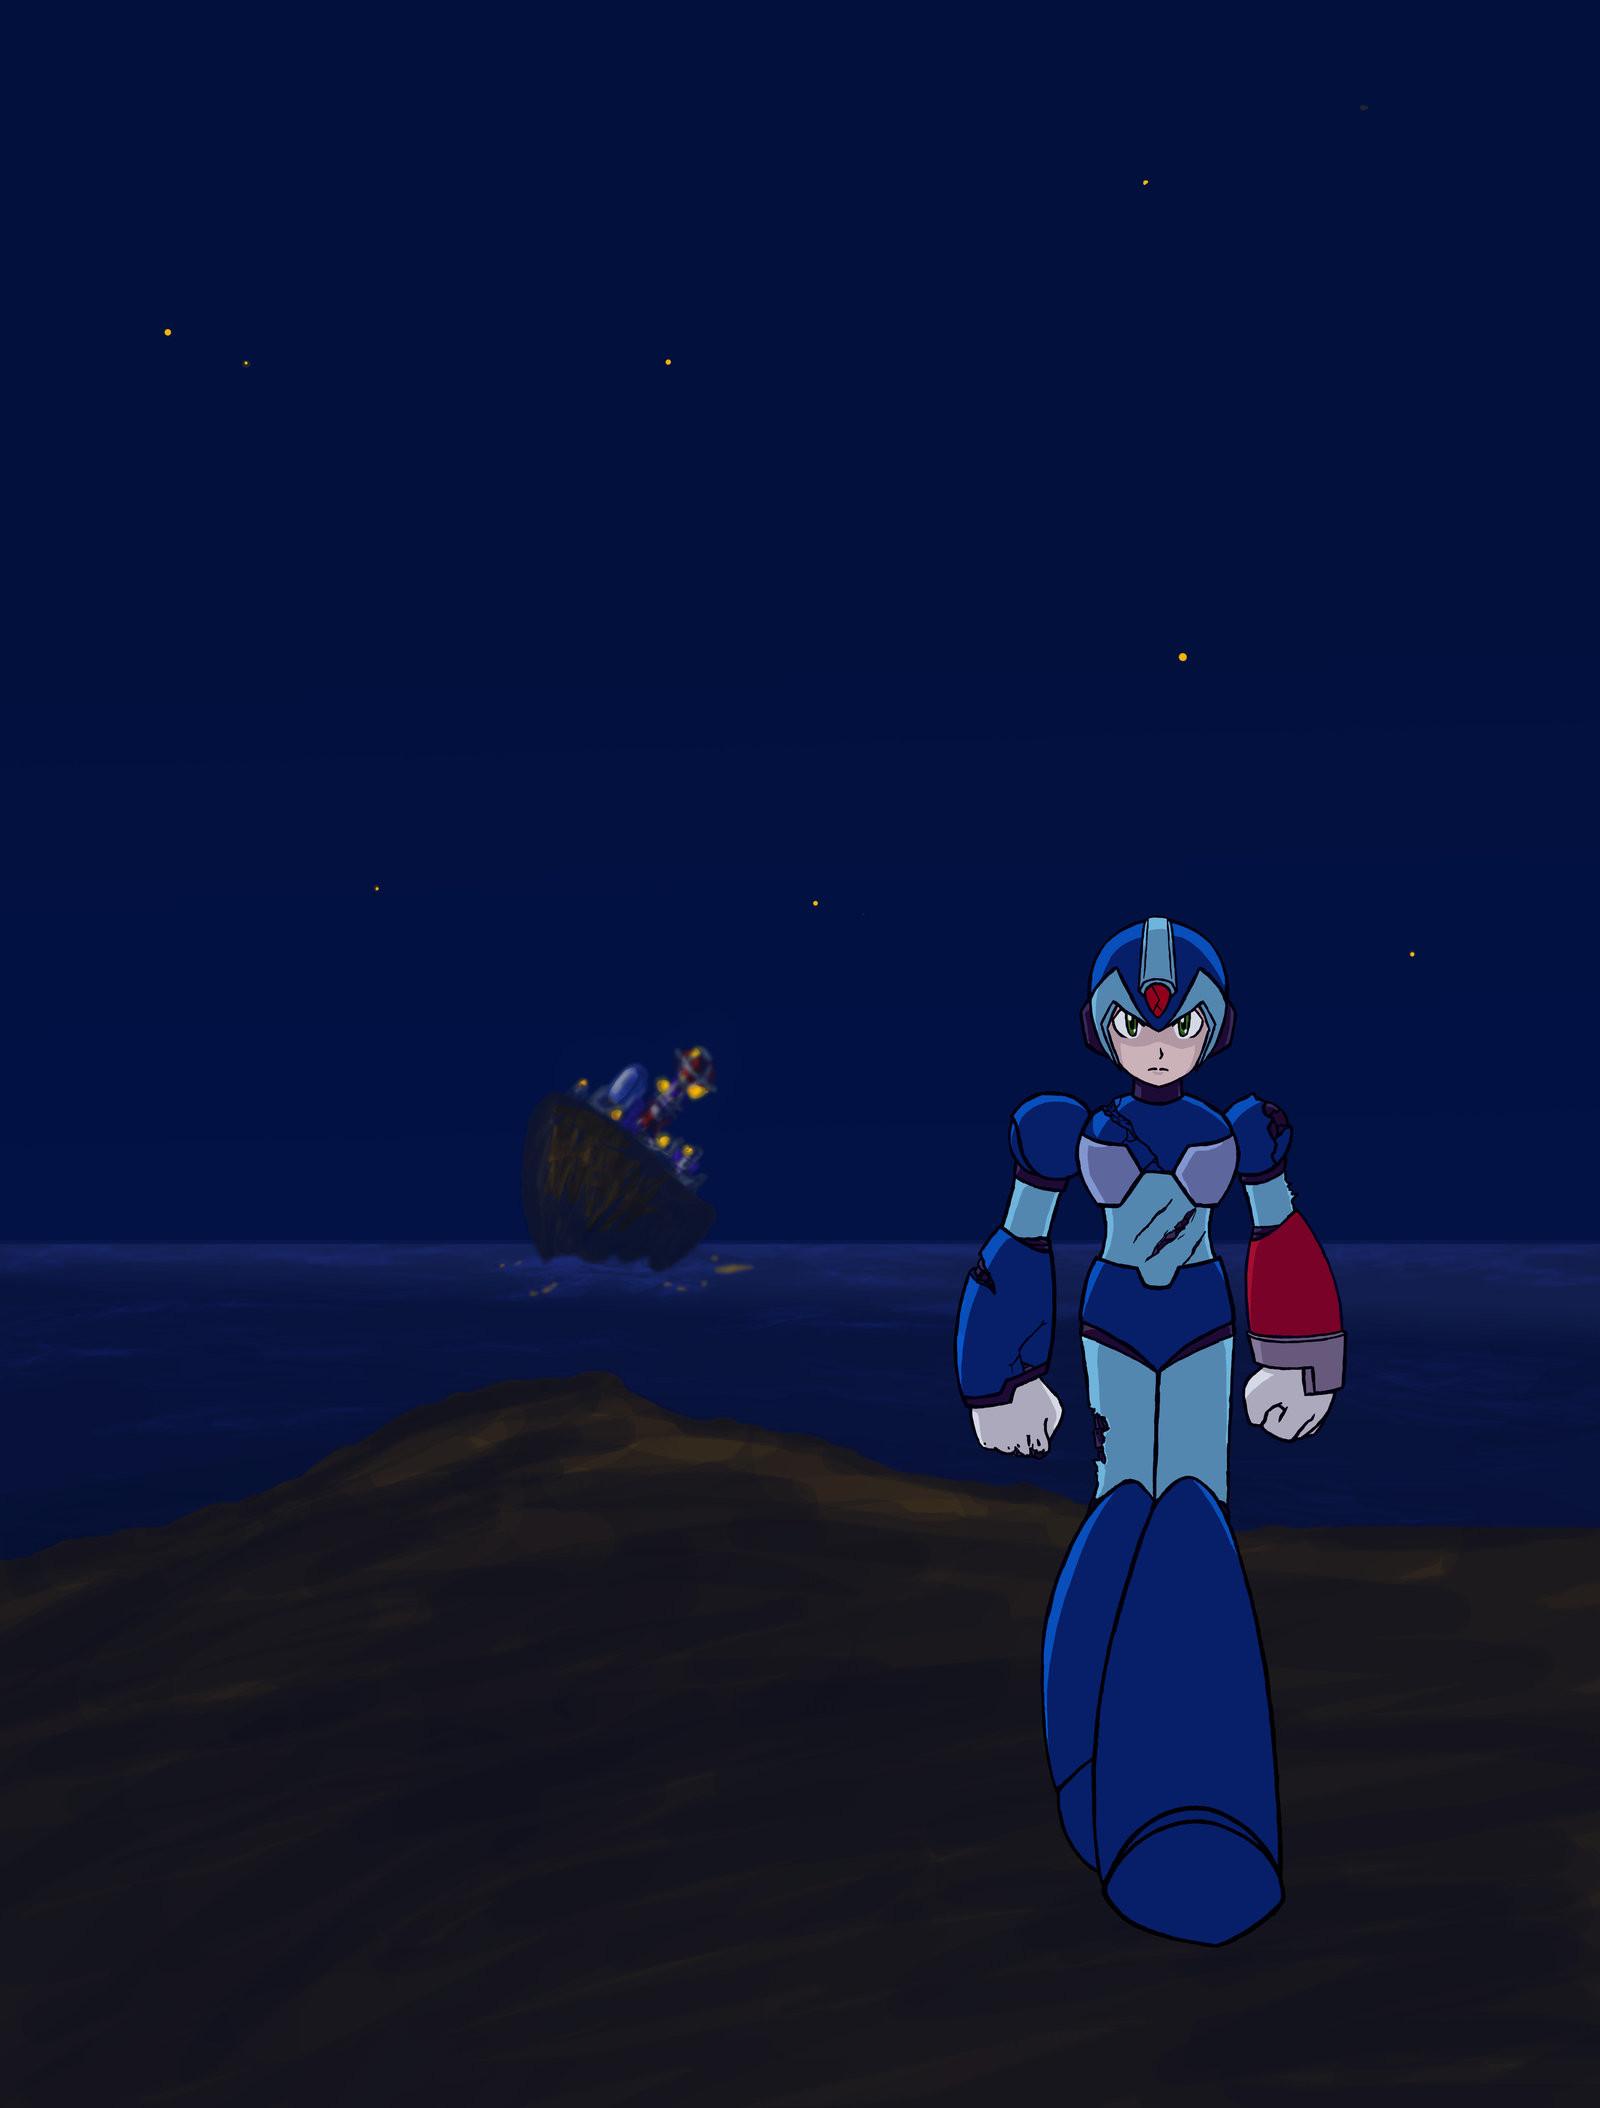 Megaman X Tribute by Camilo-sama on DeviantArt